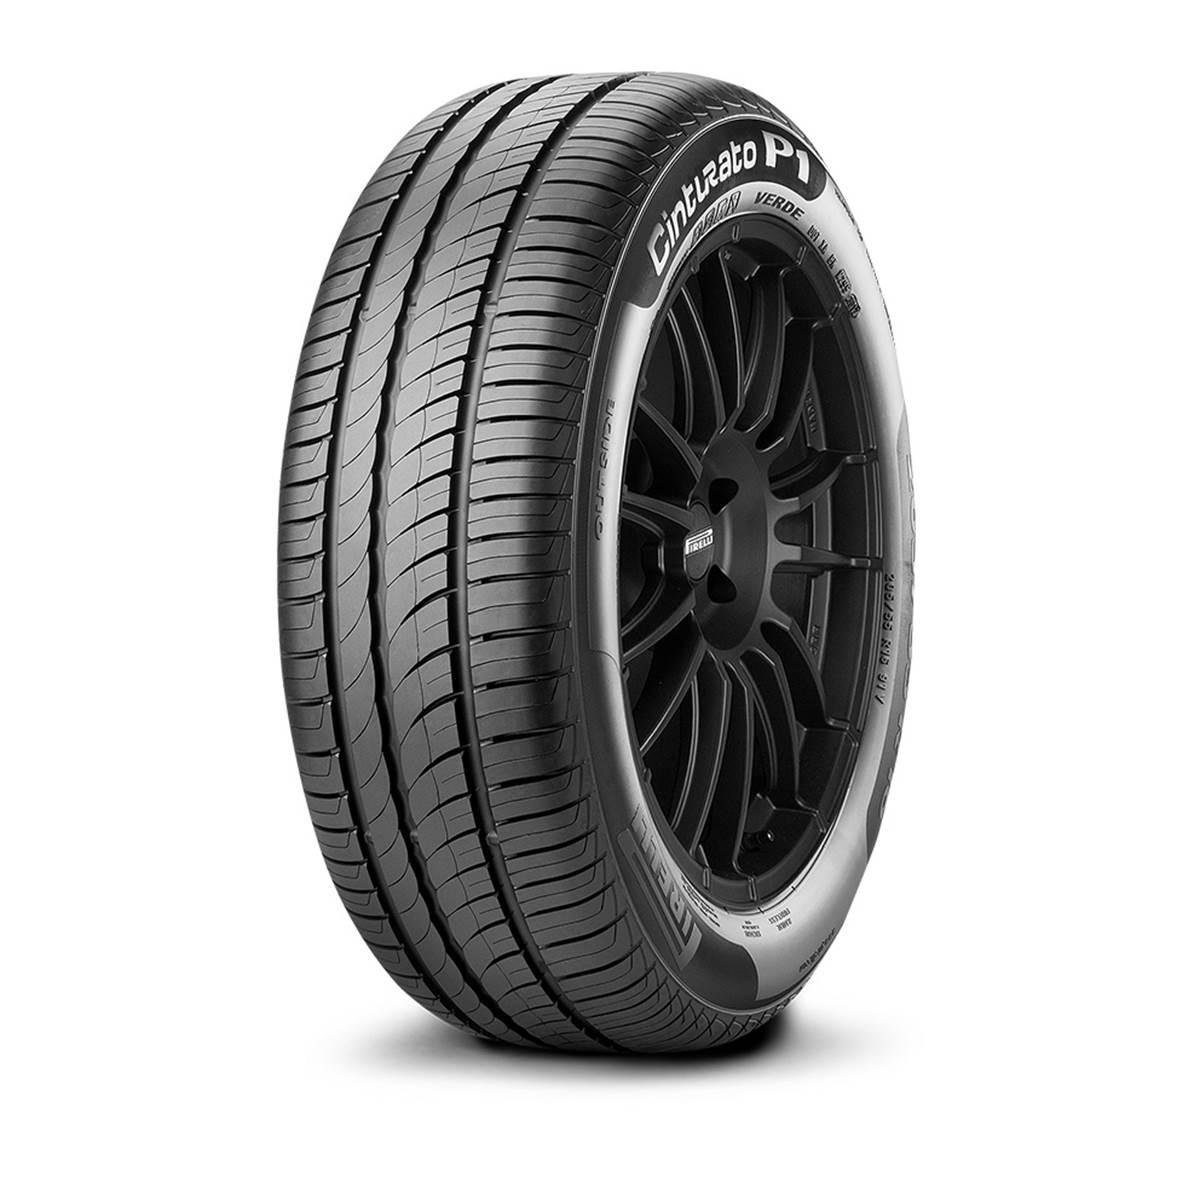 Pneu Pirelli 185/65R15 92T Cinturato P1 XL